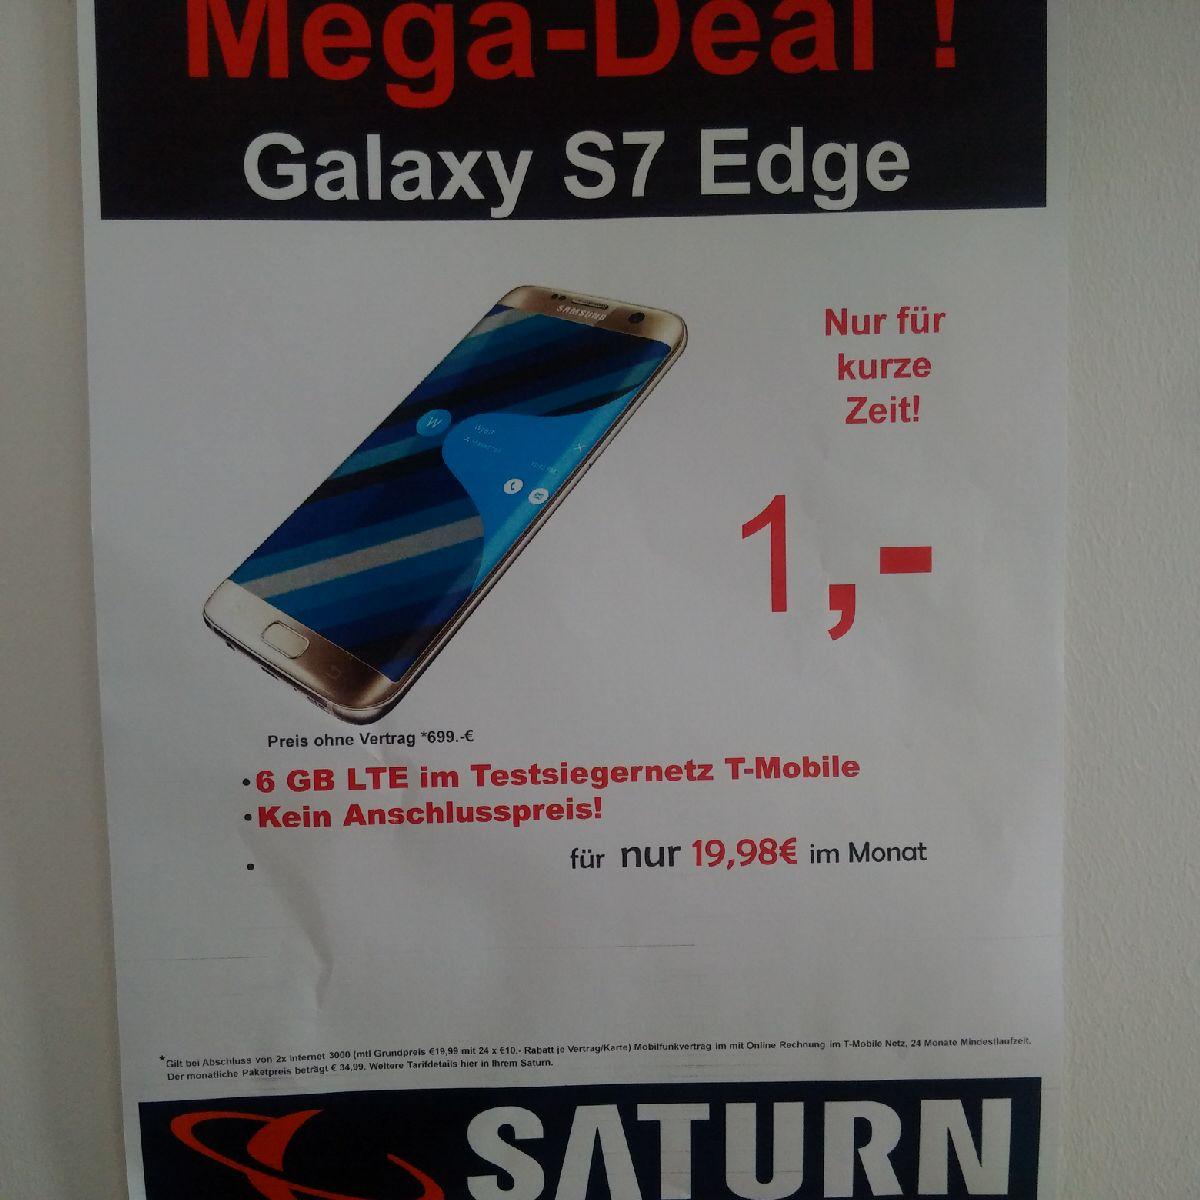 [Lokal] Samsung S7 Edge + Tab E + Telekom 6GB LTE 1x30€ + mtl 19.98€(Saturn Ludwigsburg)